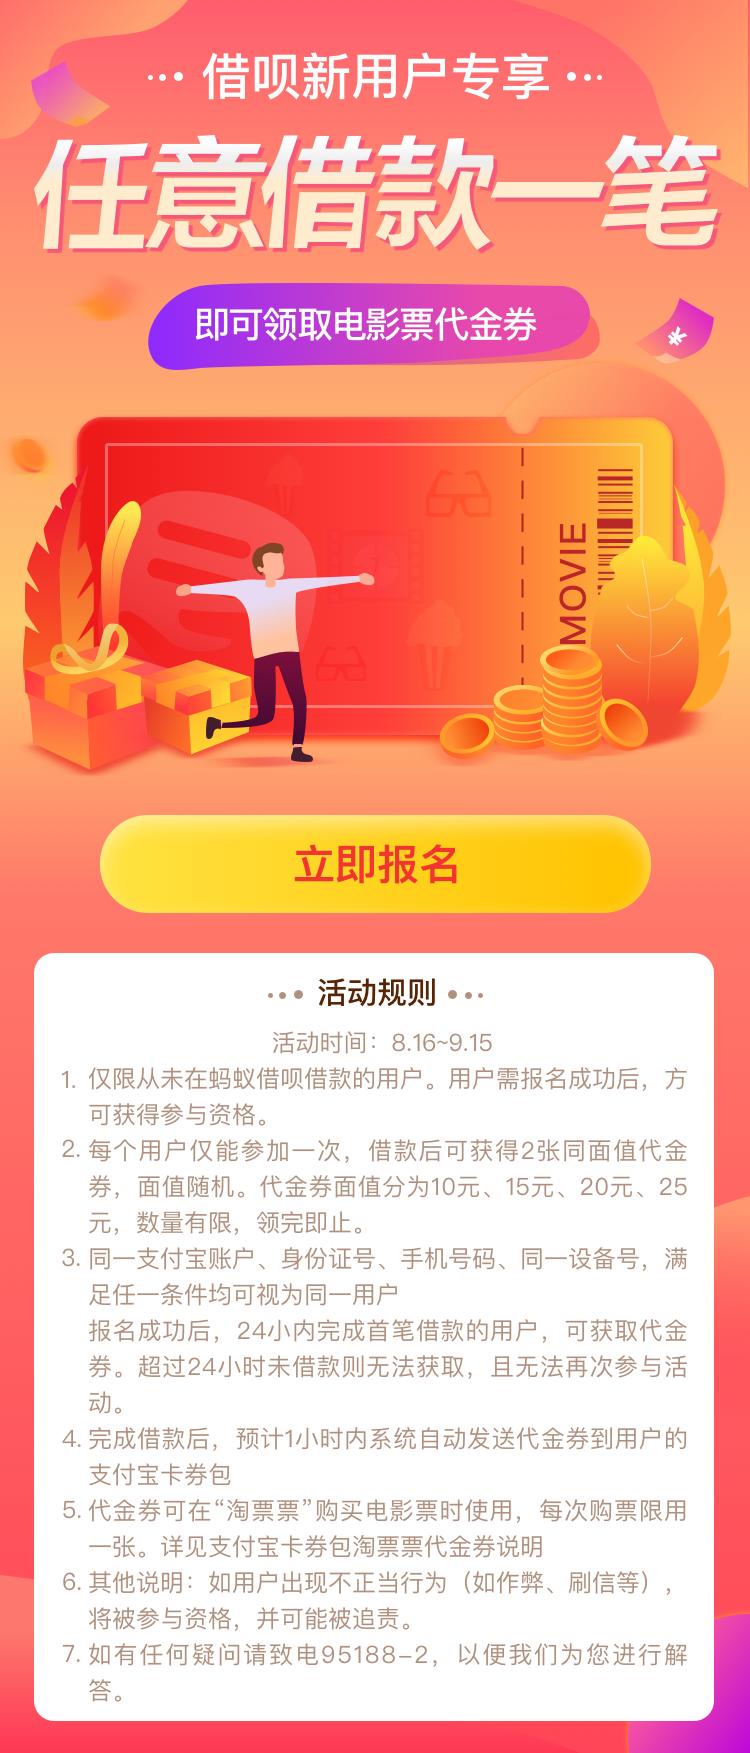 Behance 搜索 Banner design inspiration, Html5 design